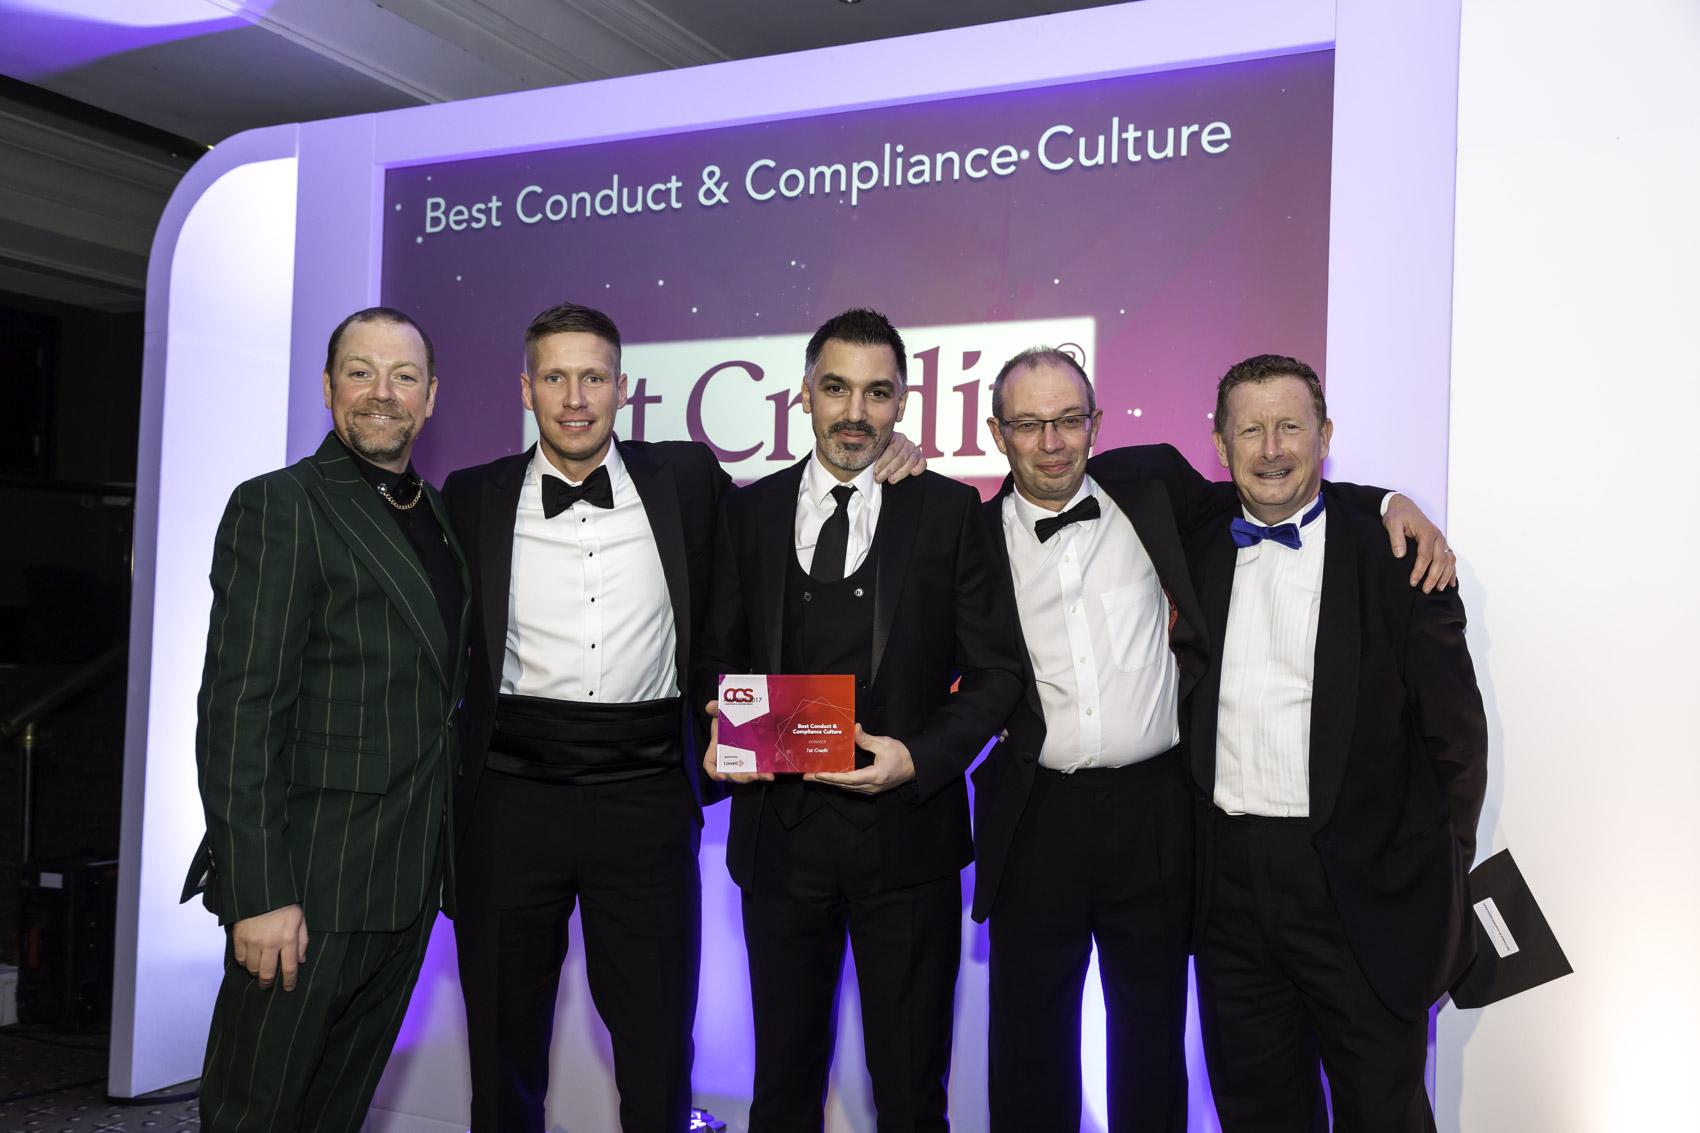 Winners CCS 2017 - 8 Best Conduct & Compliance Culture